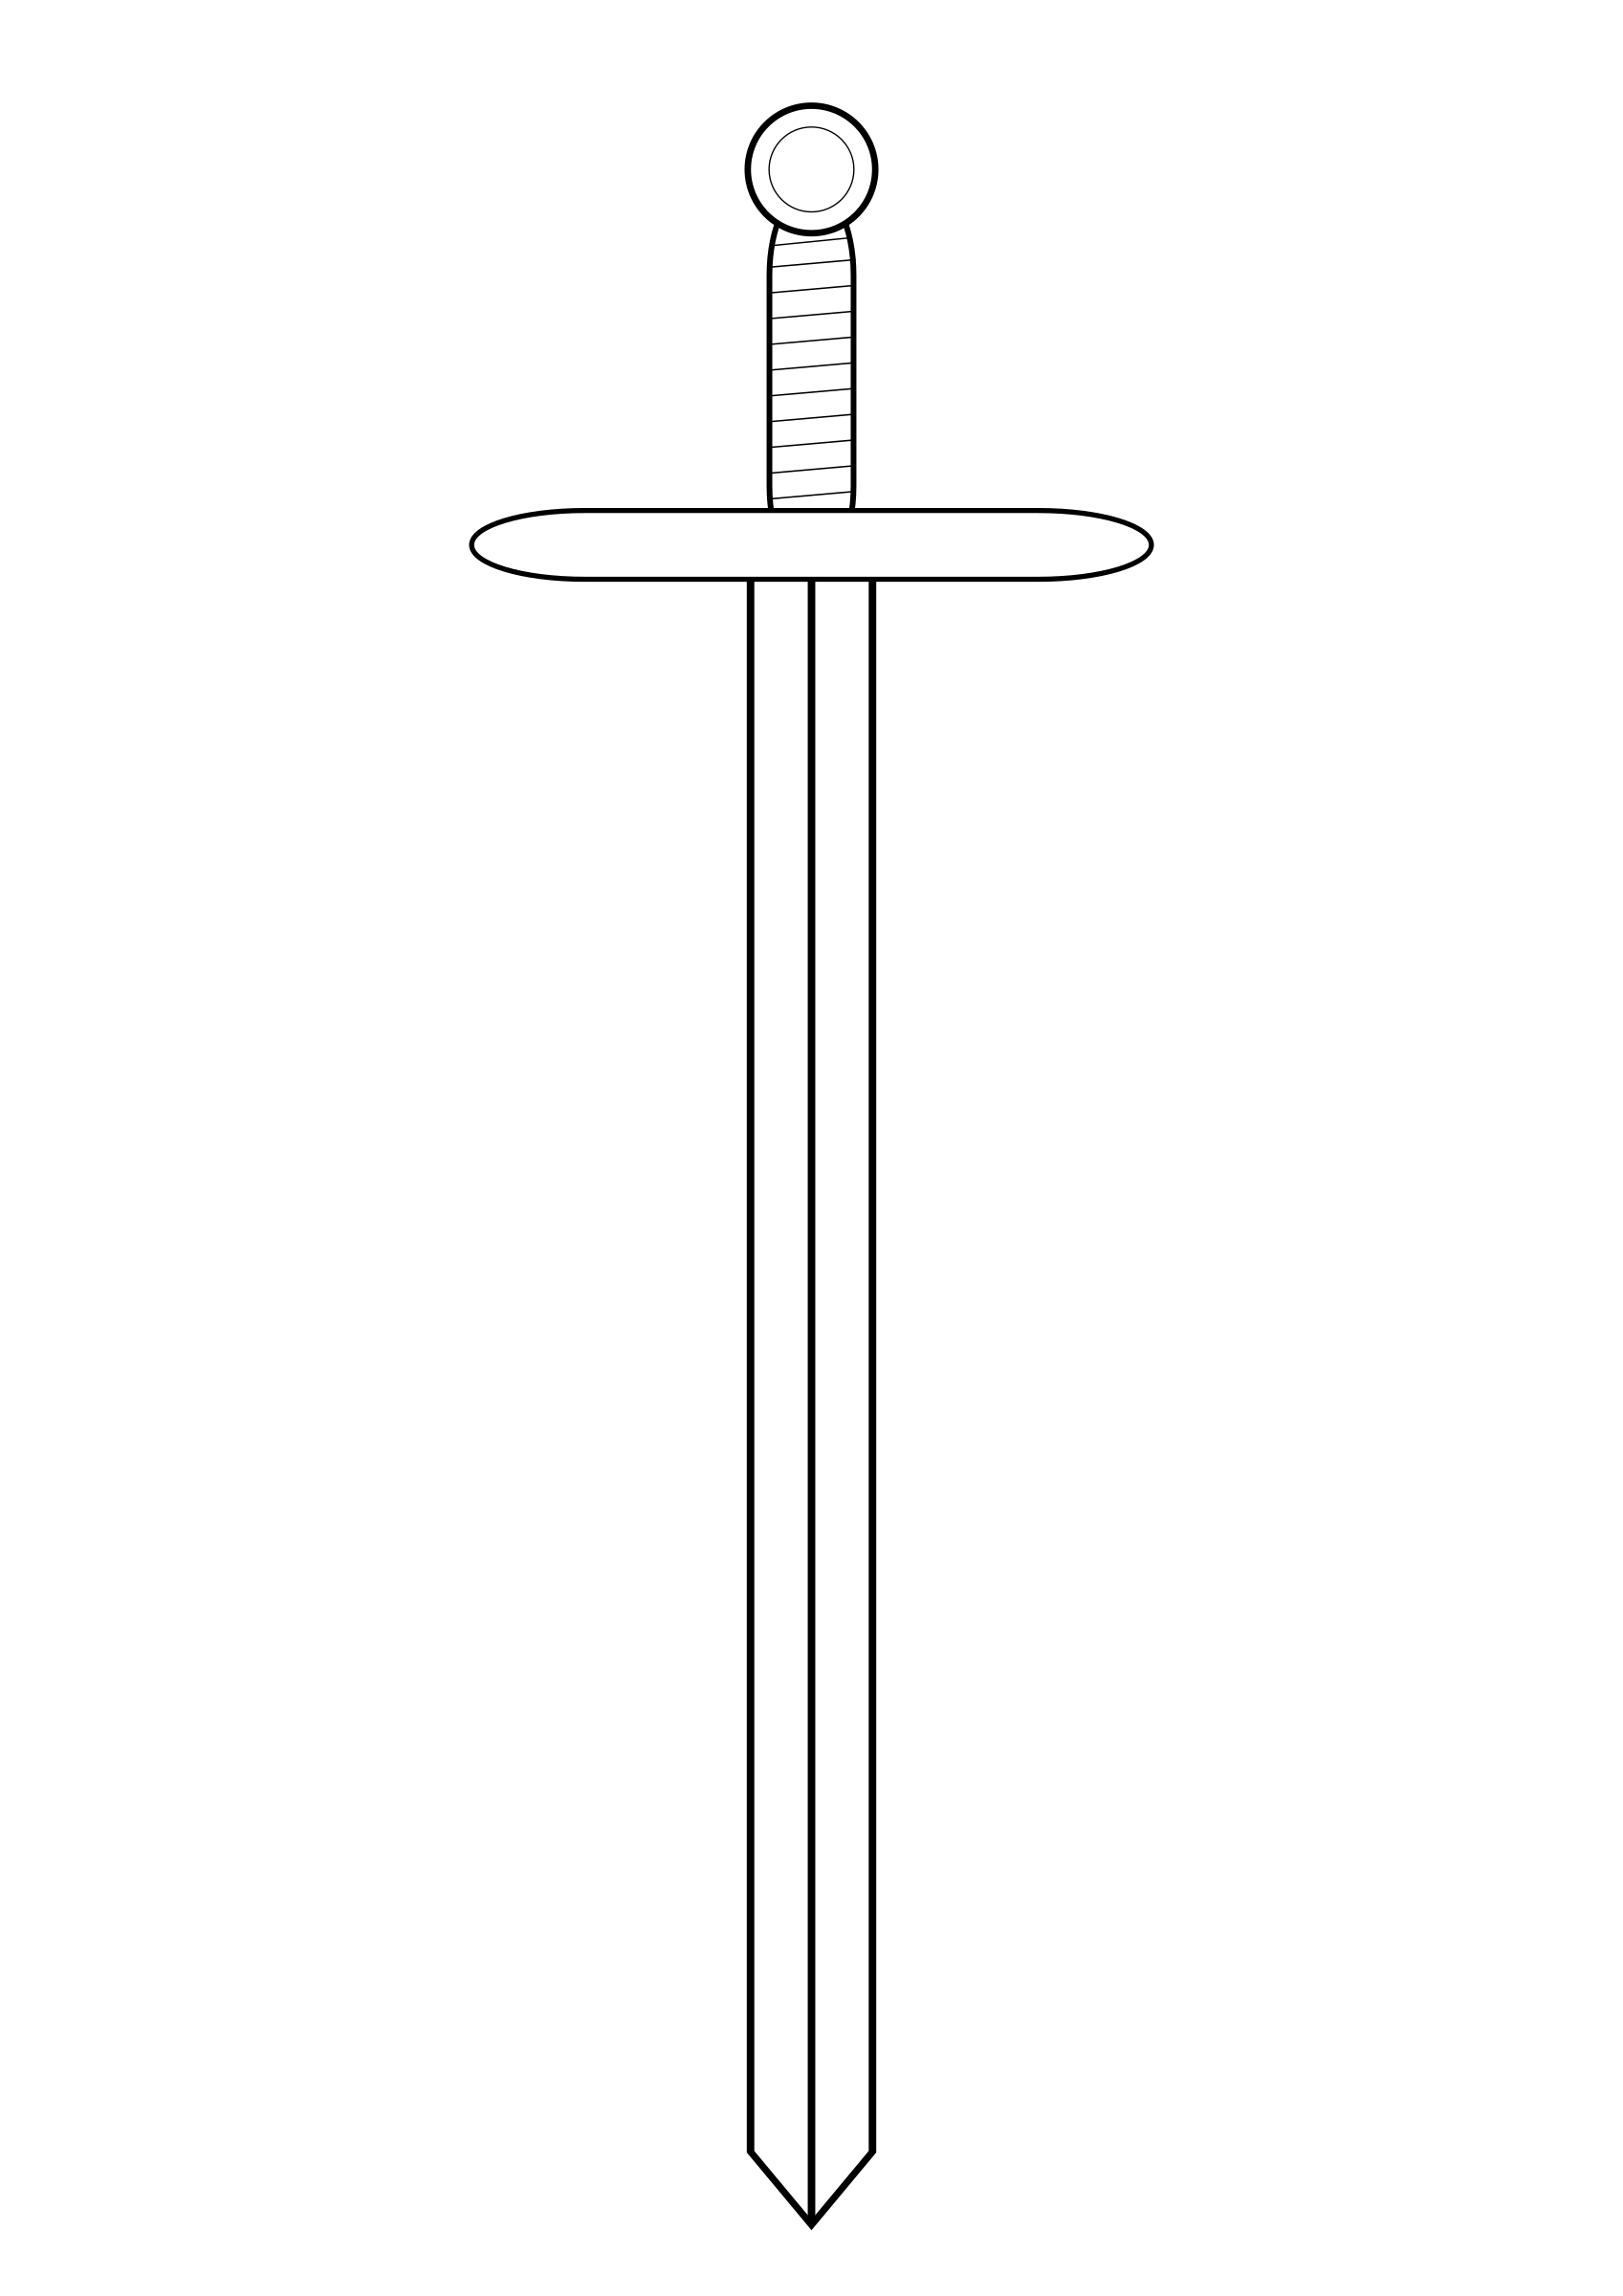 Line art big image. White clipart sword